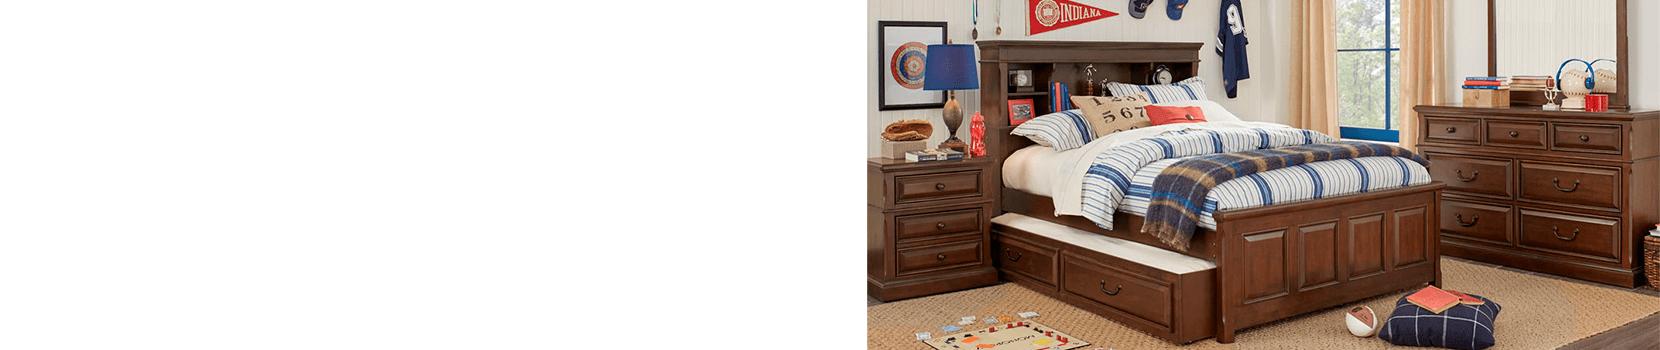 Ideas for a Tween Boy Bedroom